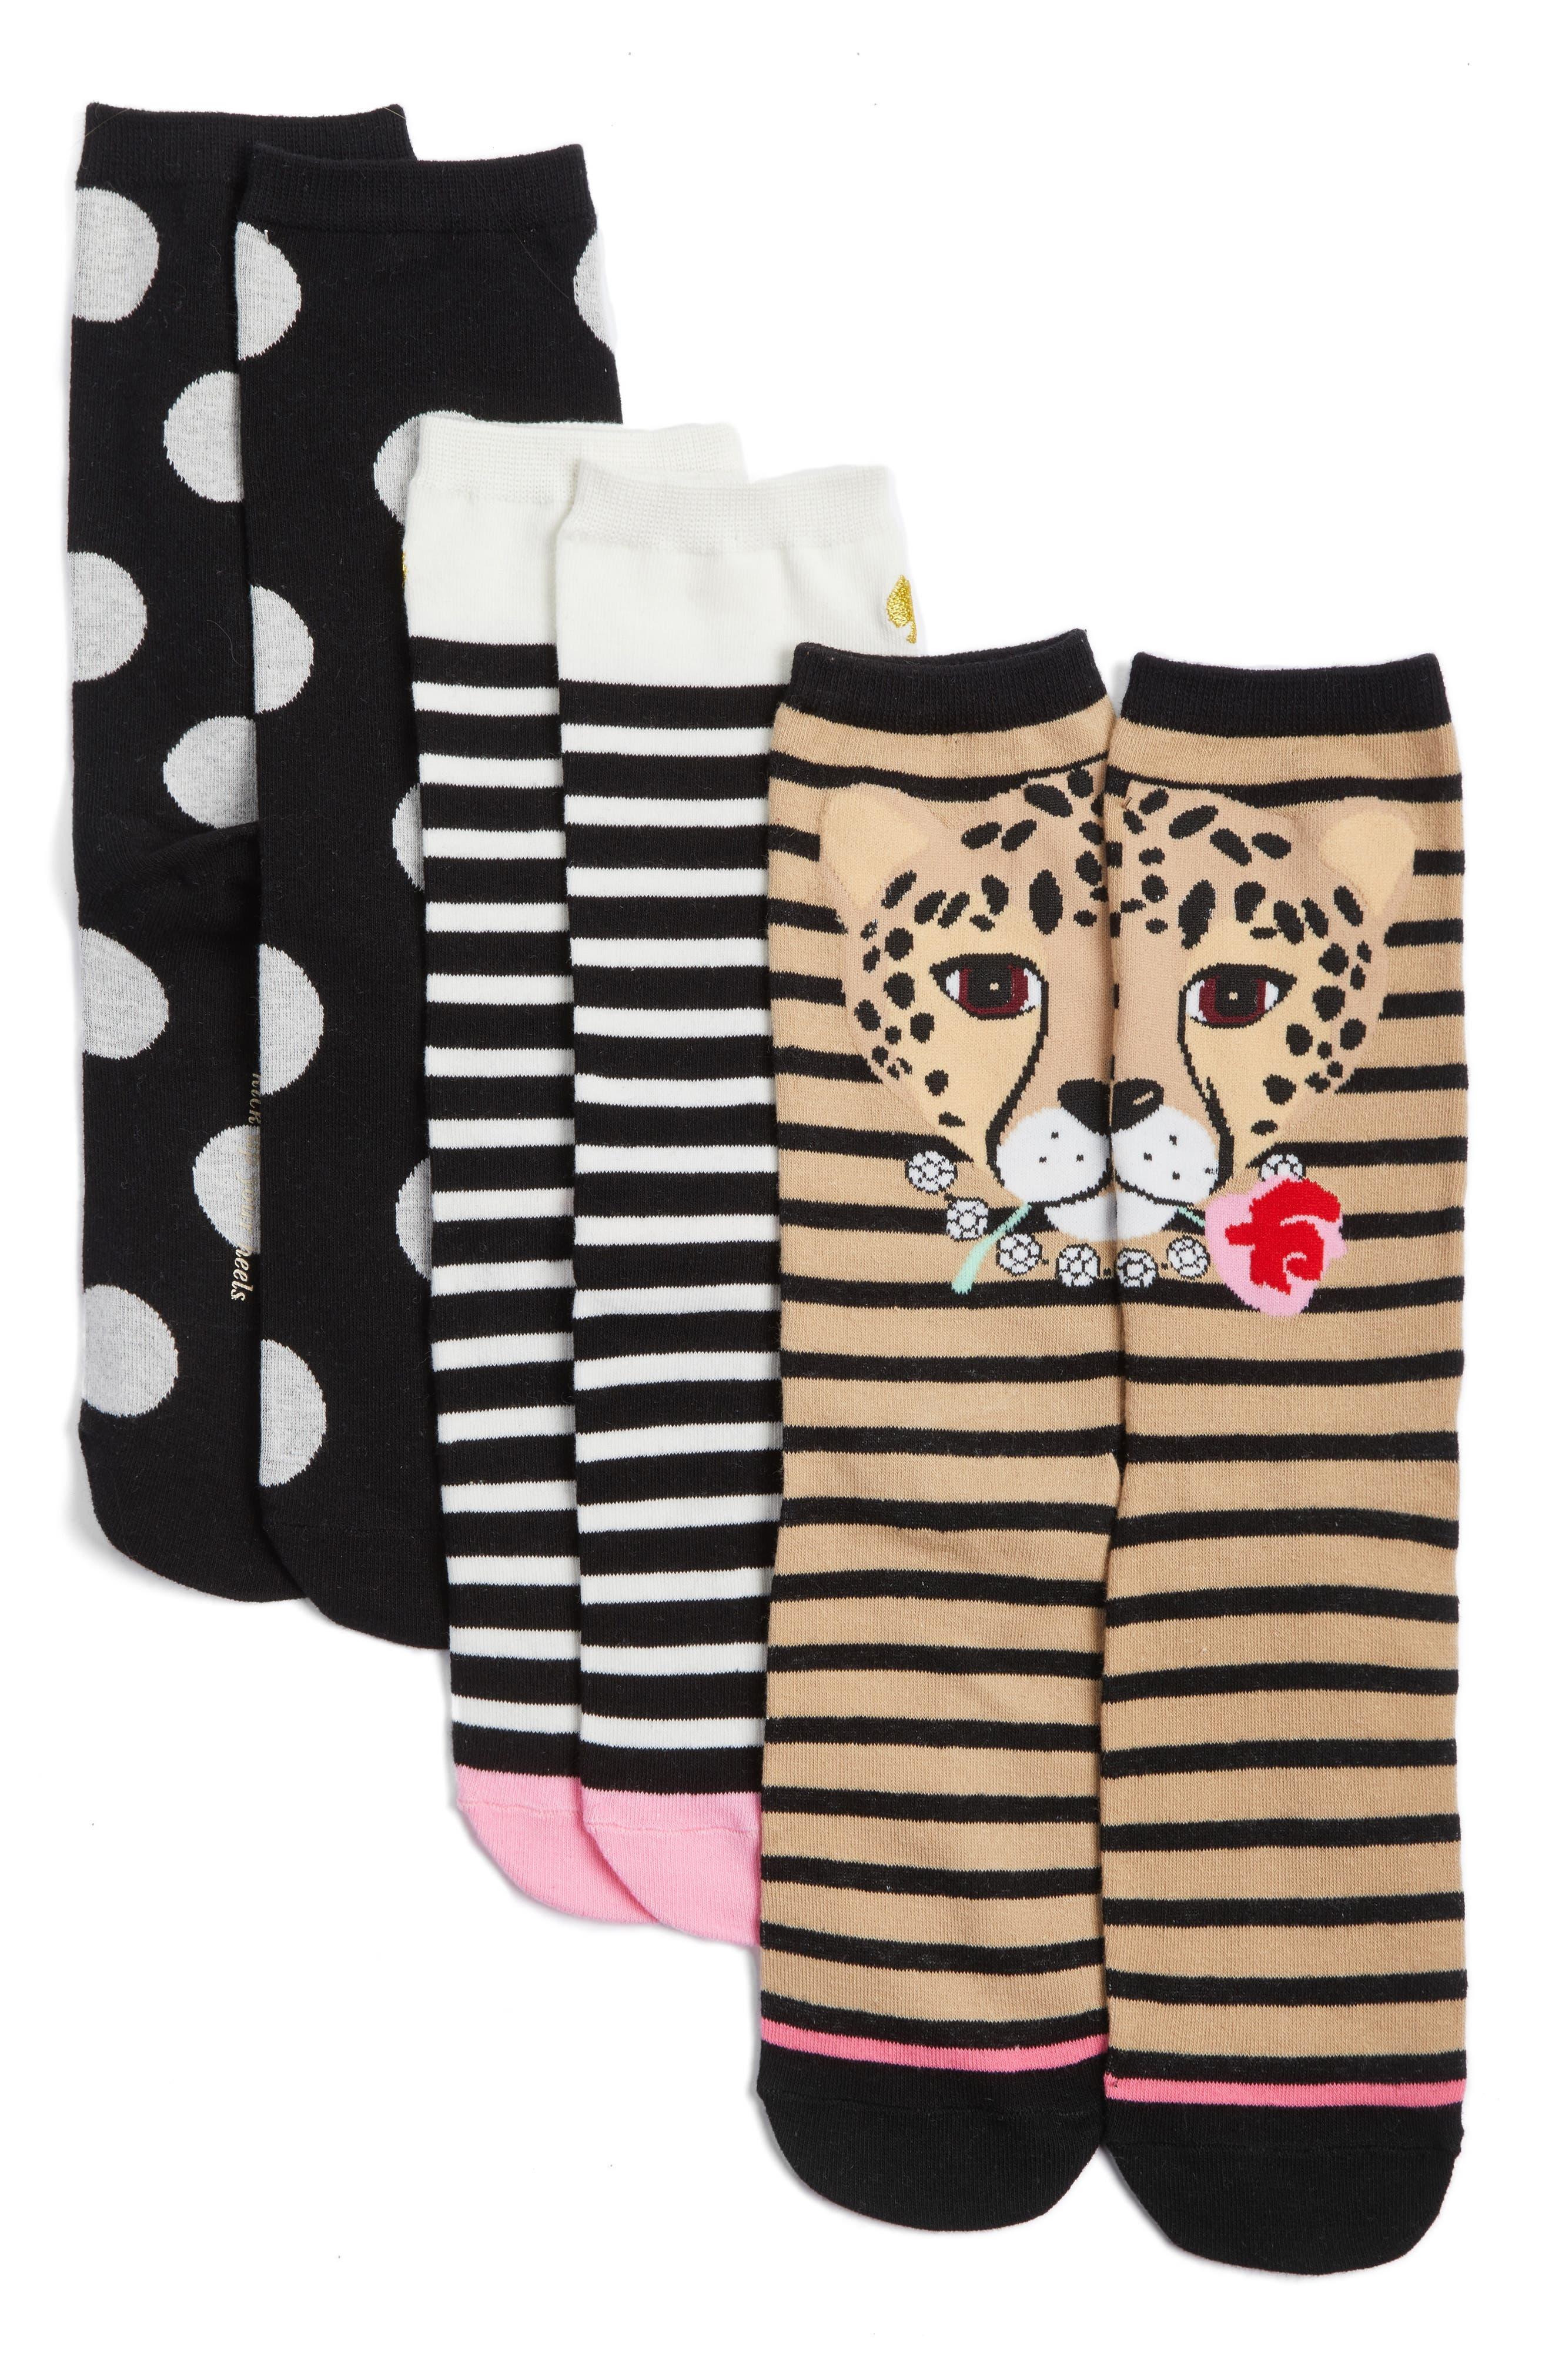 Alternate Image 1 Selected - kate spade new york 3-pack cheetah trouser socks